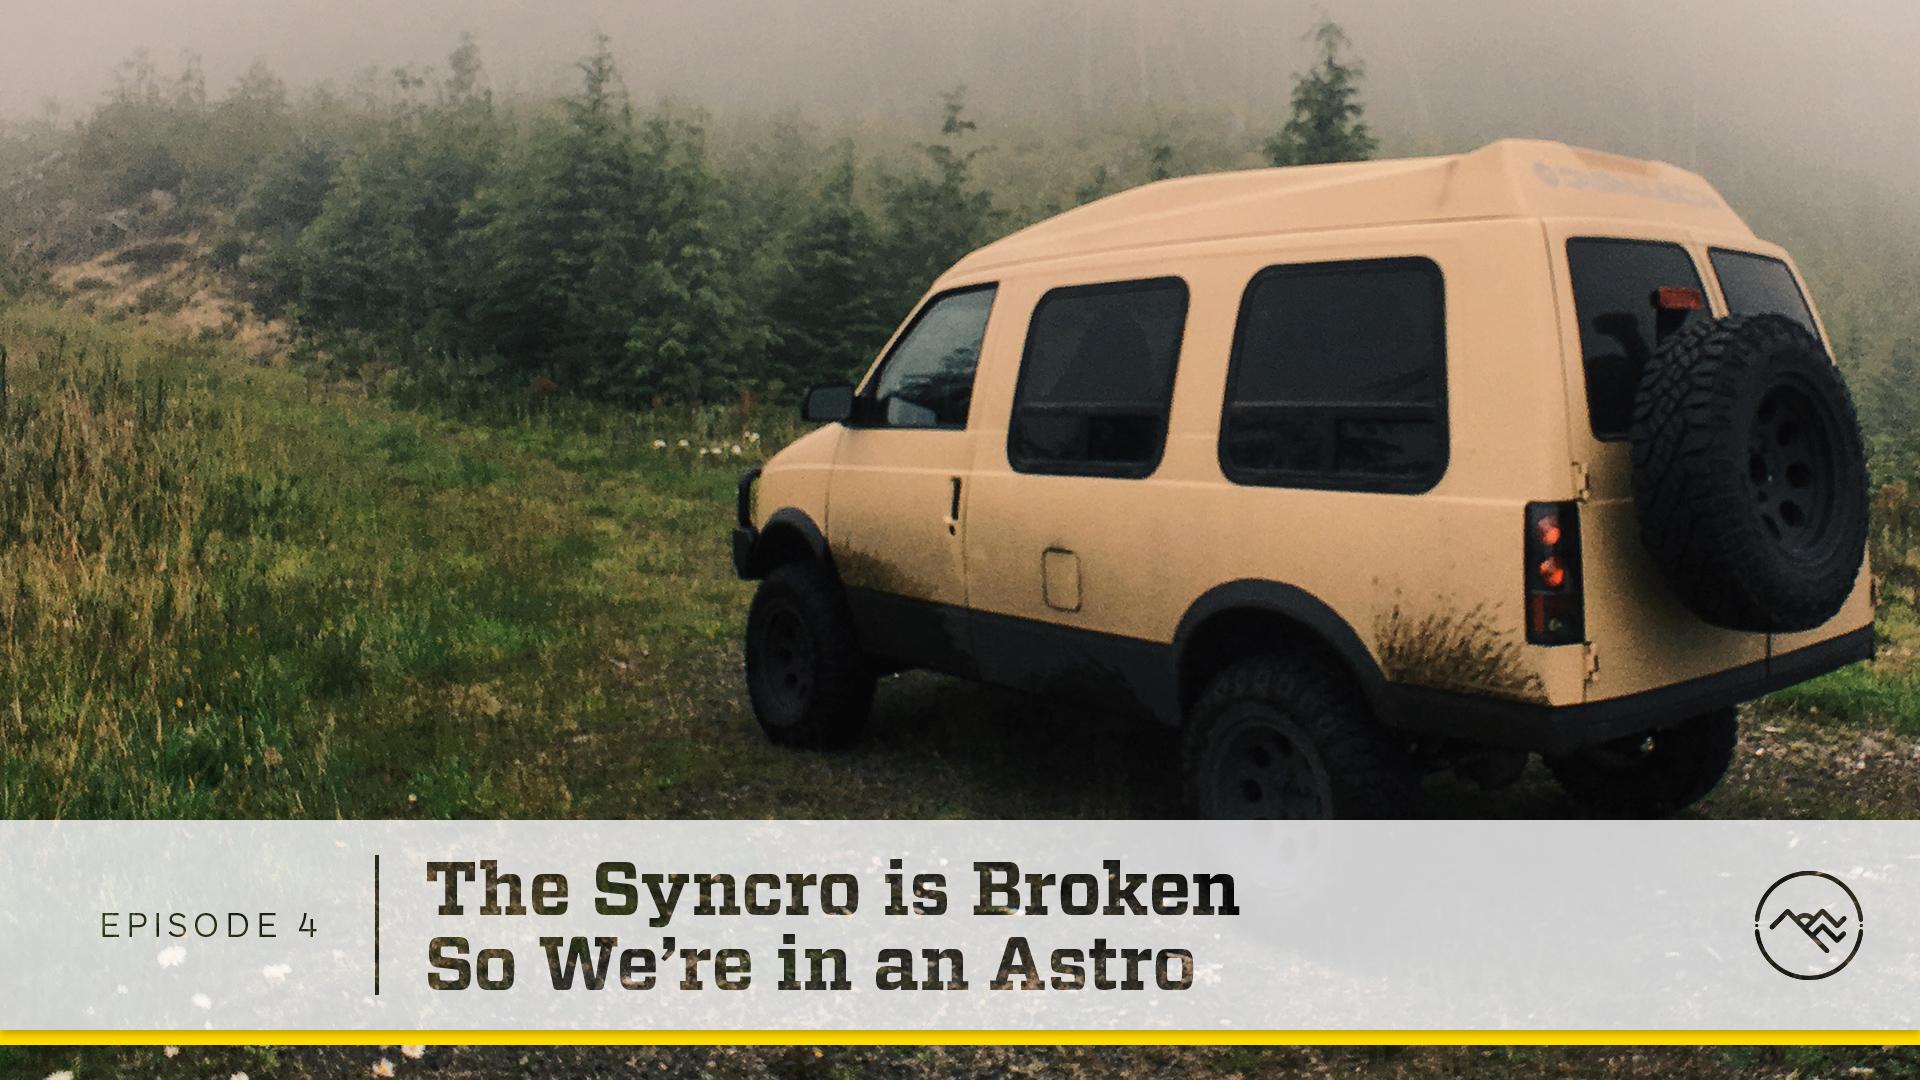 E04 : The Syncro is Broken so We're in an Astro